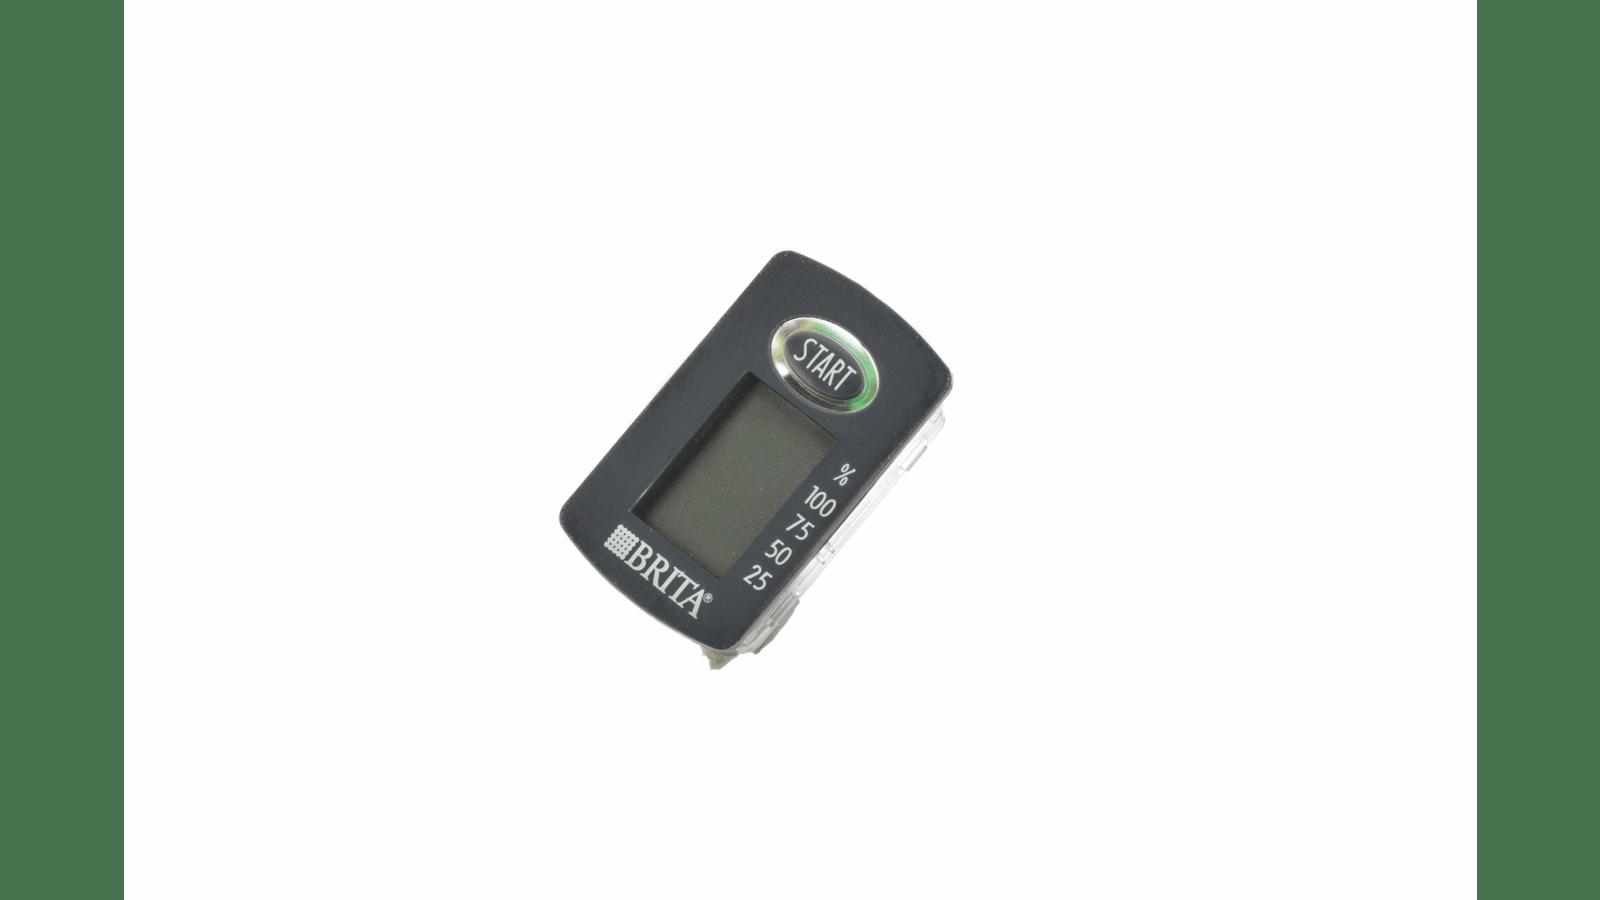 Electronic Memo Gauge Filter Change Indicator For Brita Magimix Bosch Tassimo